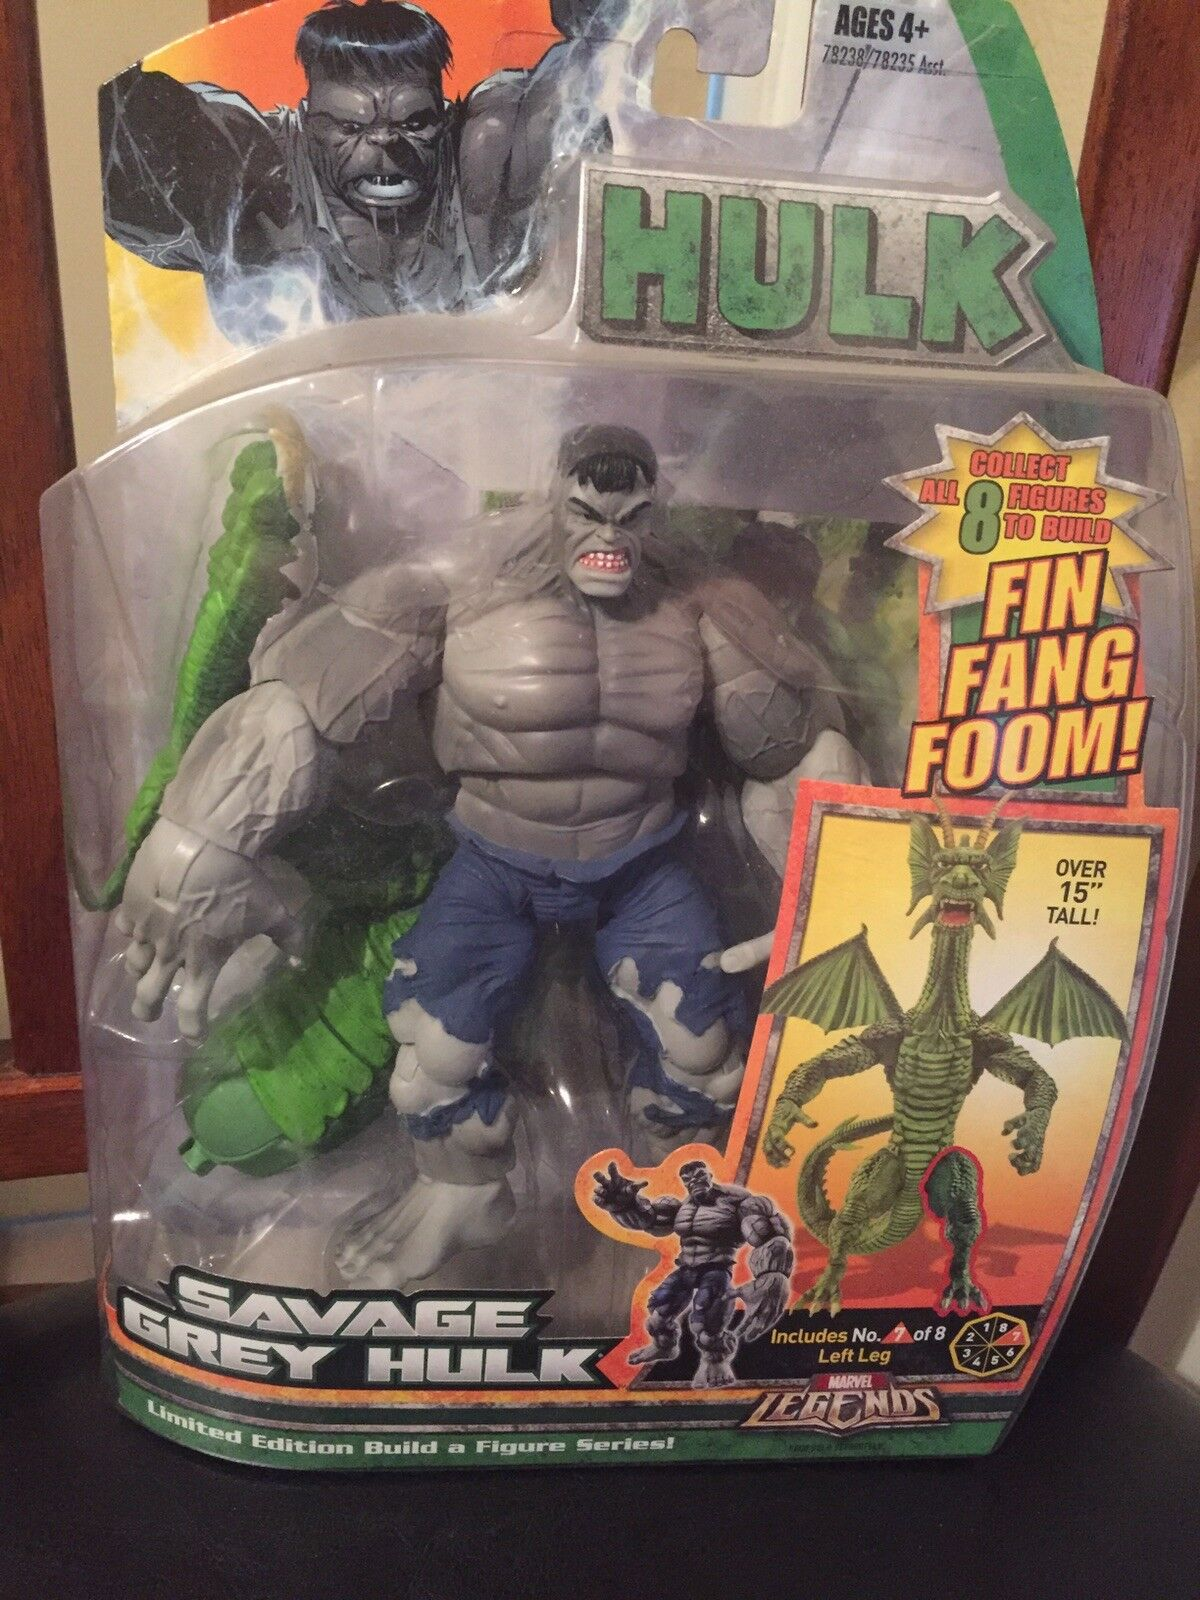 Marvel Legends RARE Savage gris Hulk-Fin Fang Foom collection   dans les promotions de stade